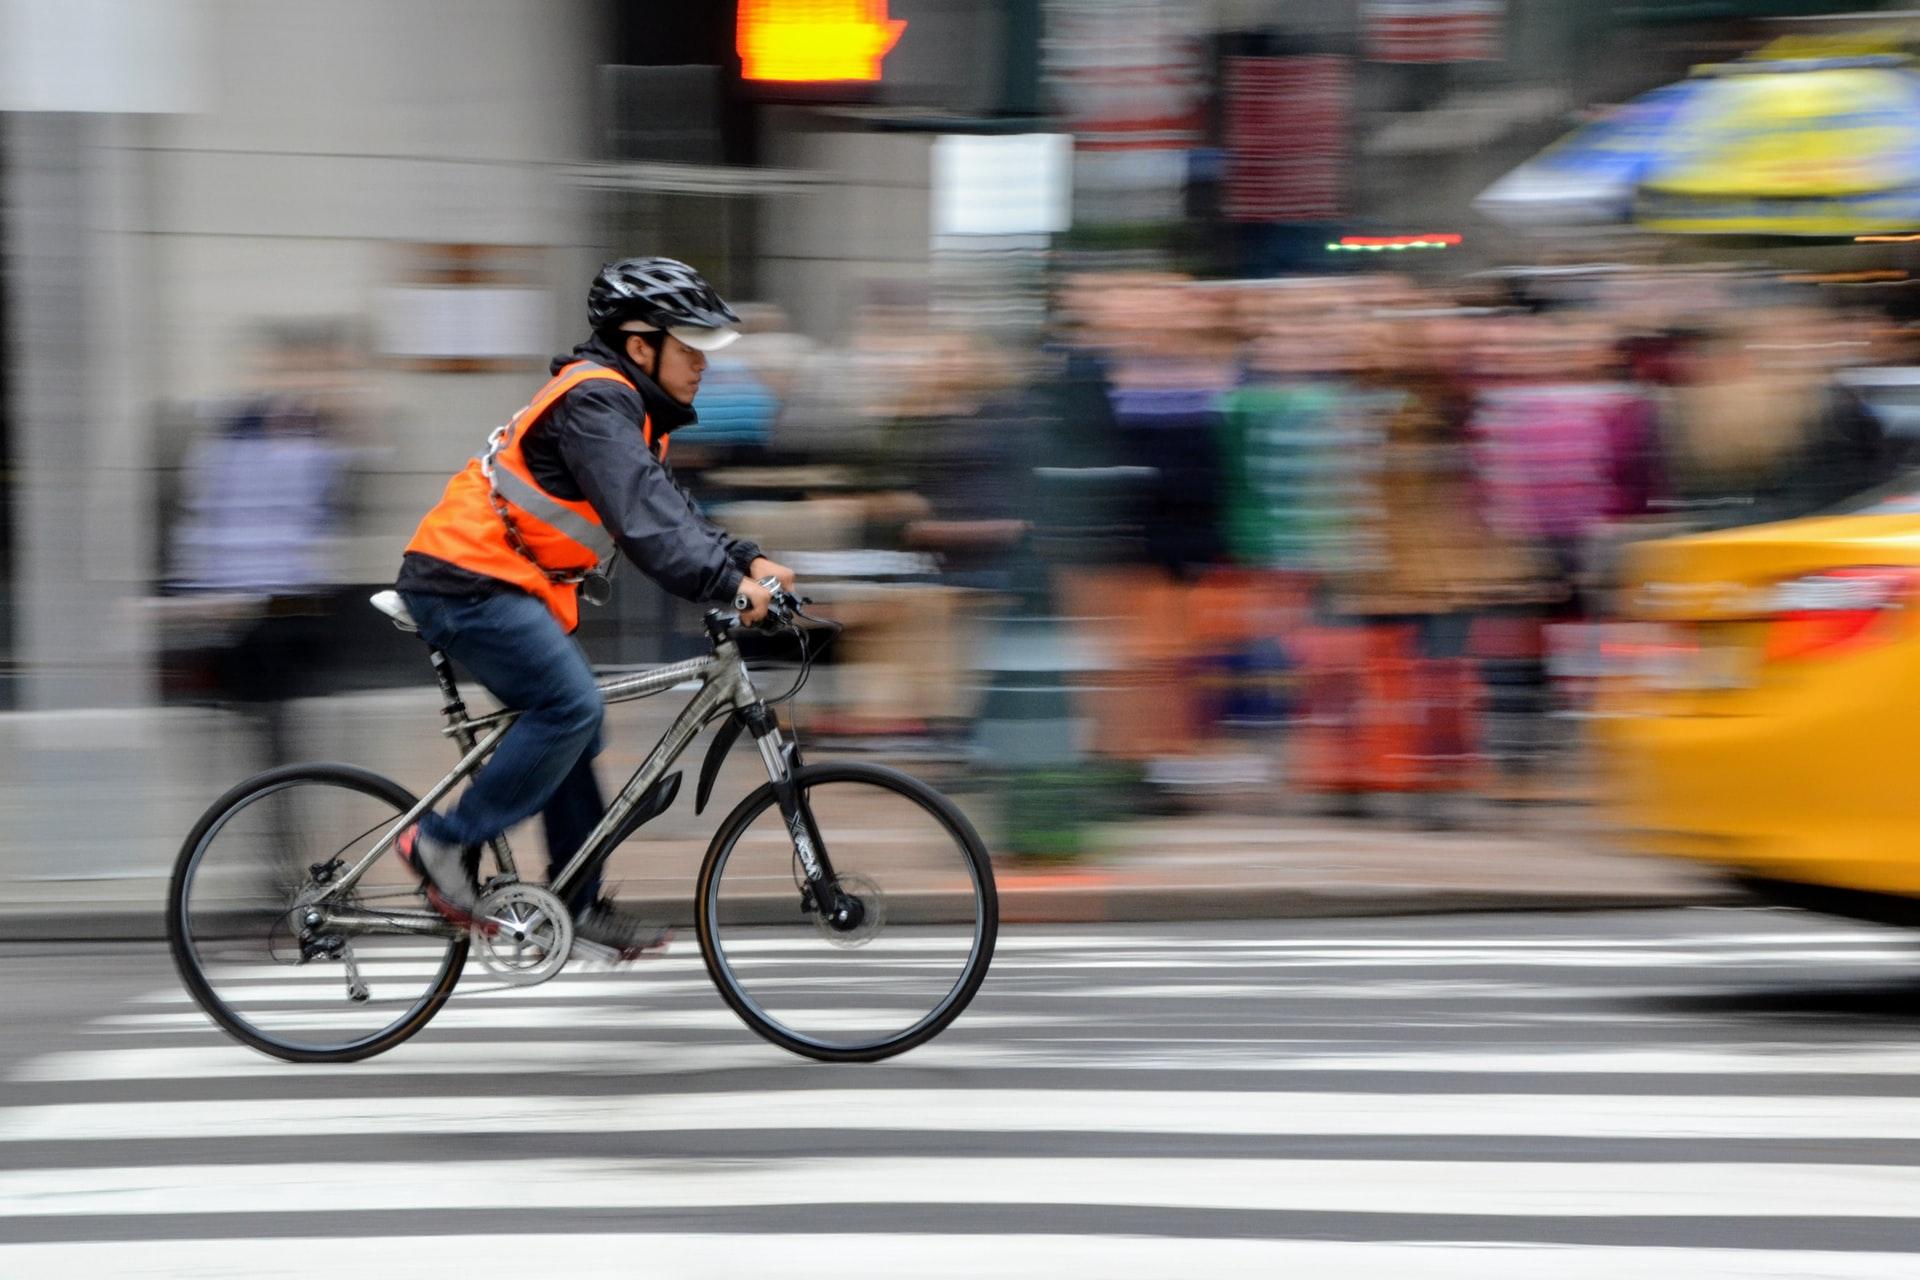 Buying A City Commuter Bike